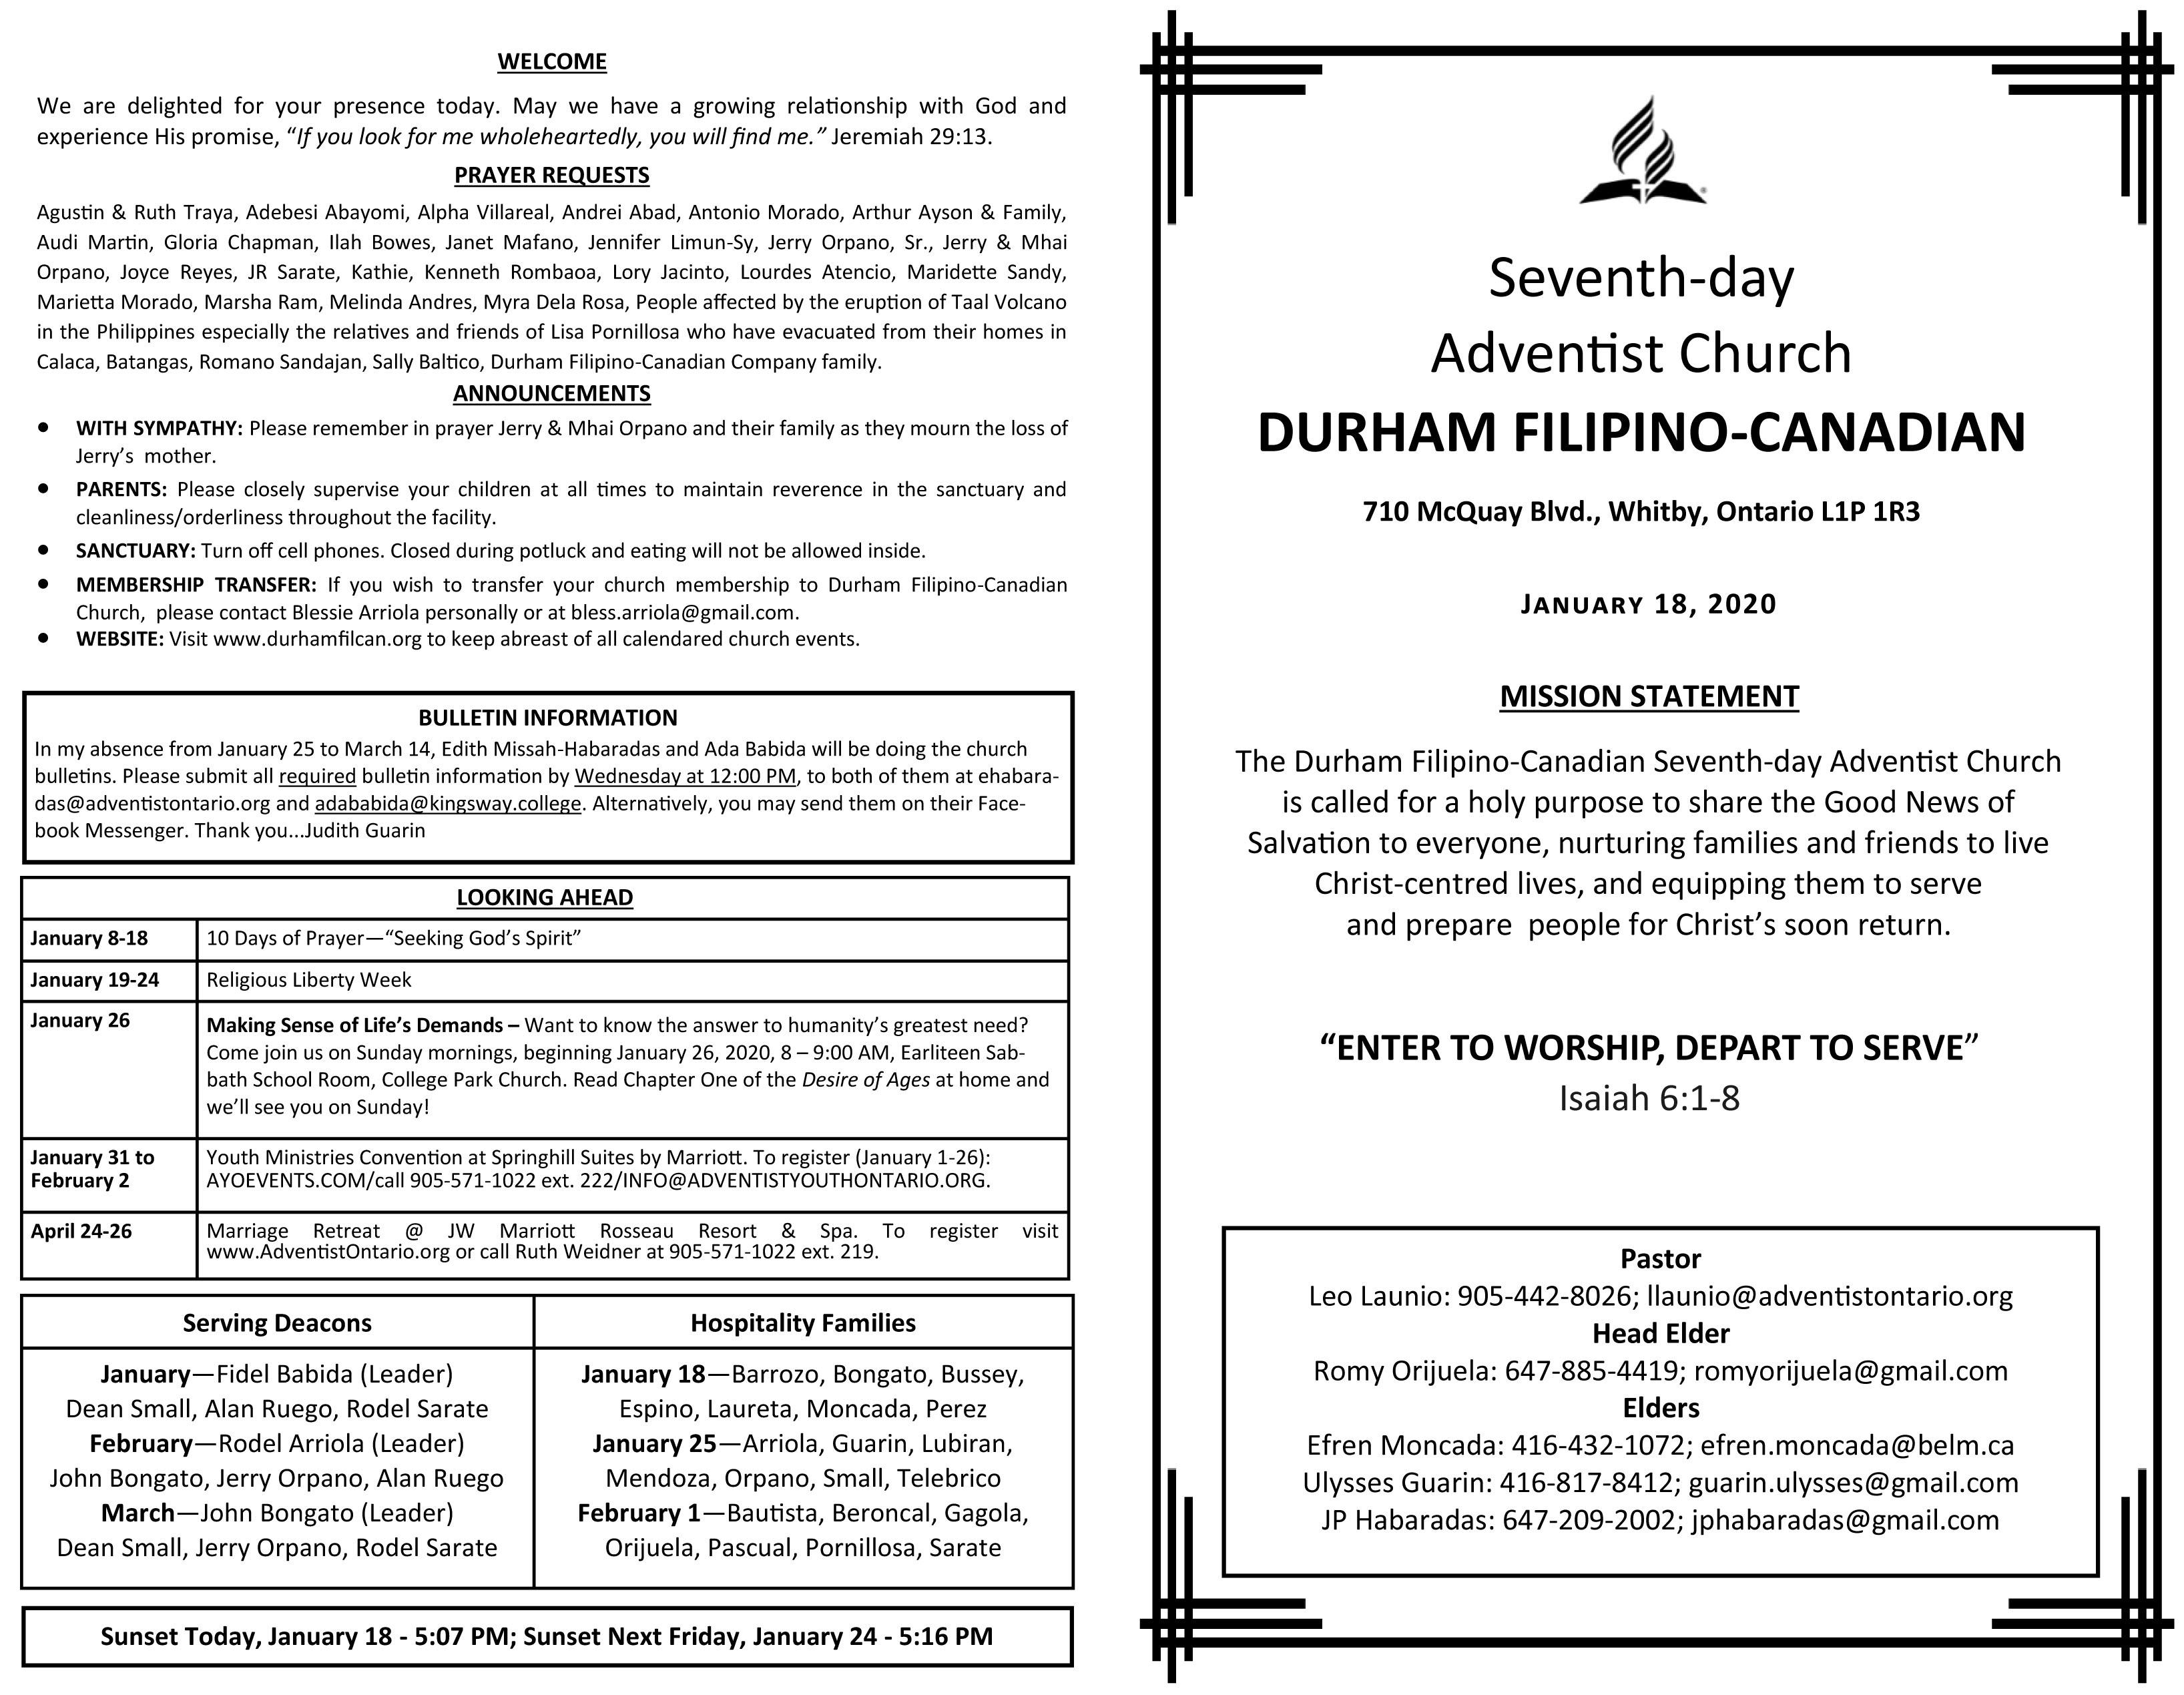 DFCC Church Bulletin Jan 18, 2020